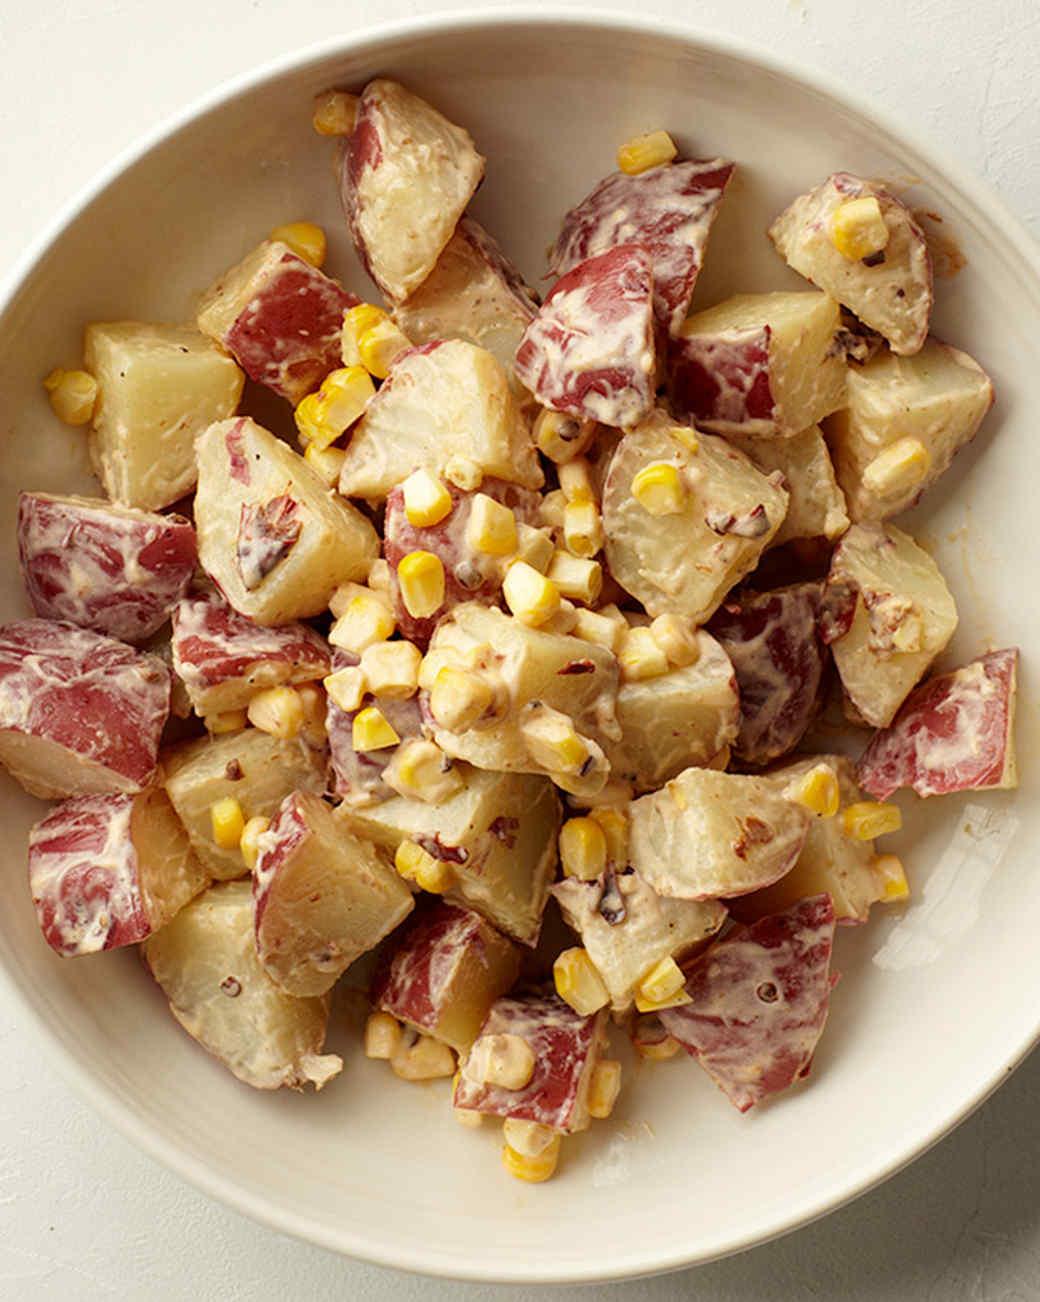 mexican-potato-salad-005-ed110107.jpg